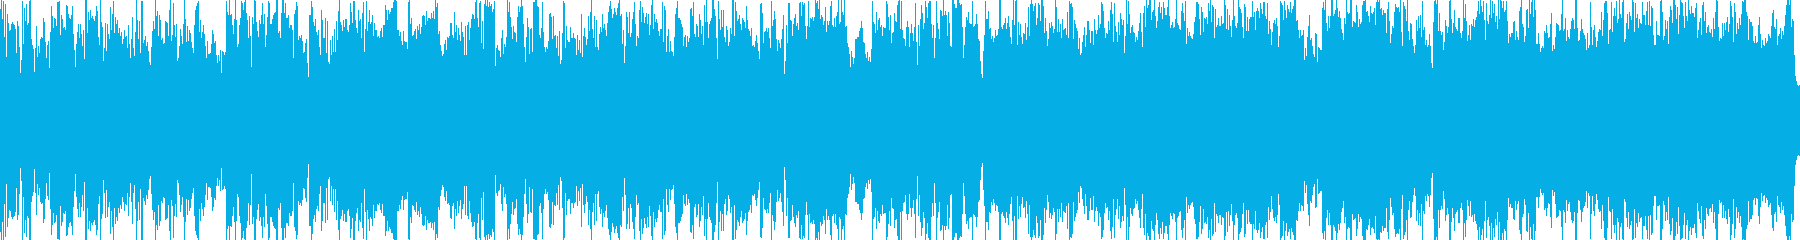 8bitピコピコ(つなぎ)の再生済みの波形